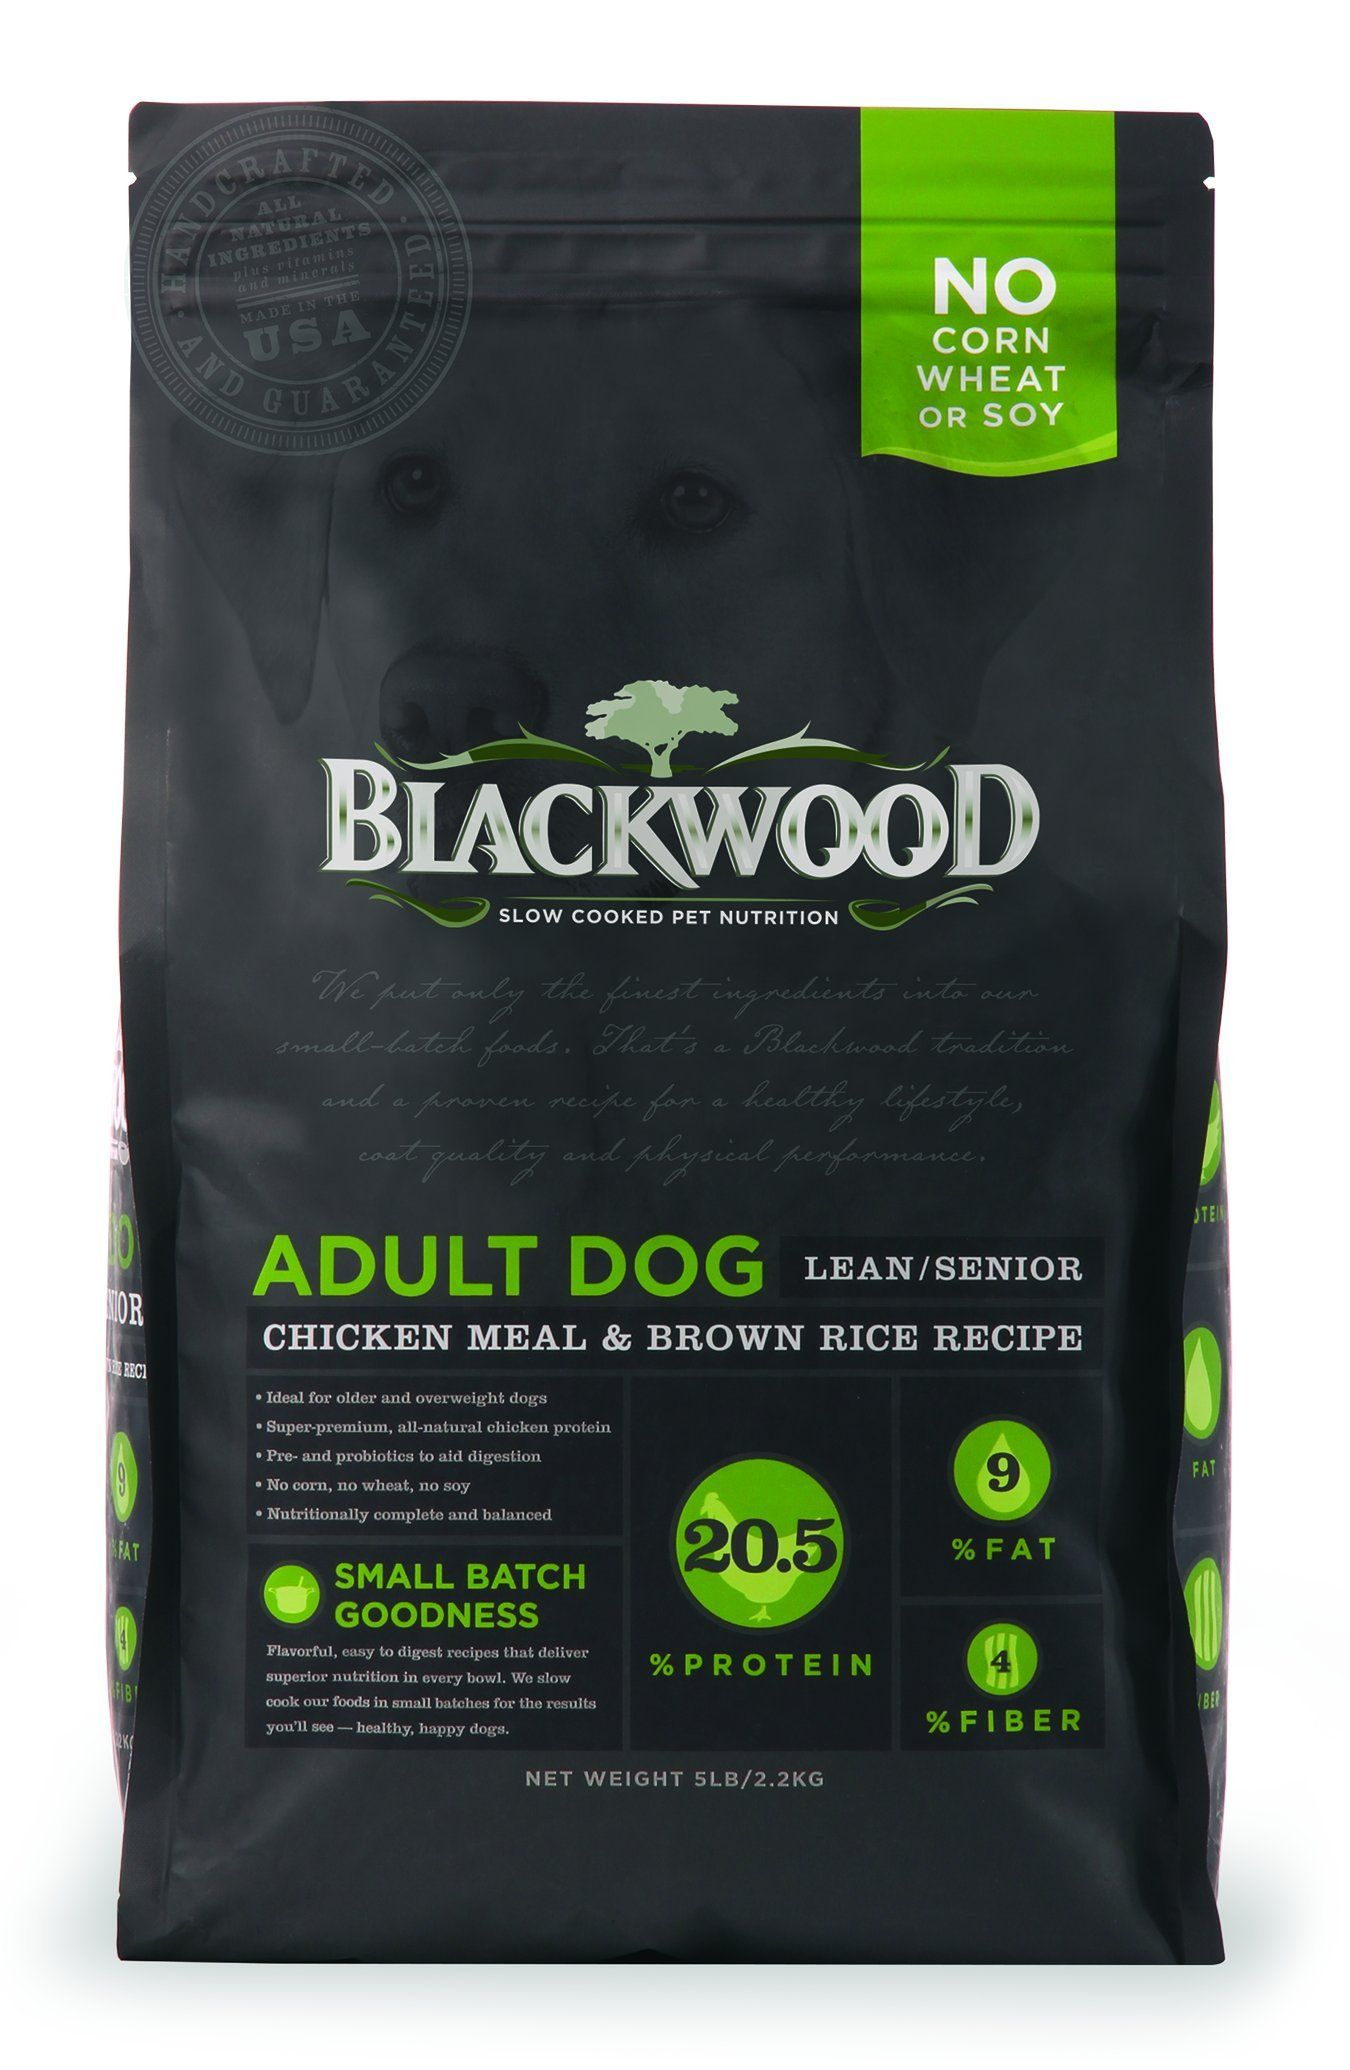 Blackwood Pet Food 22246 Adult Dog Lean Senior Chicken Meal And